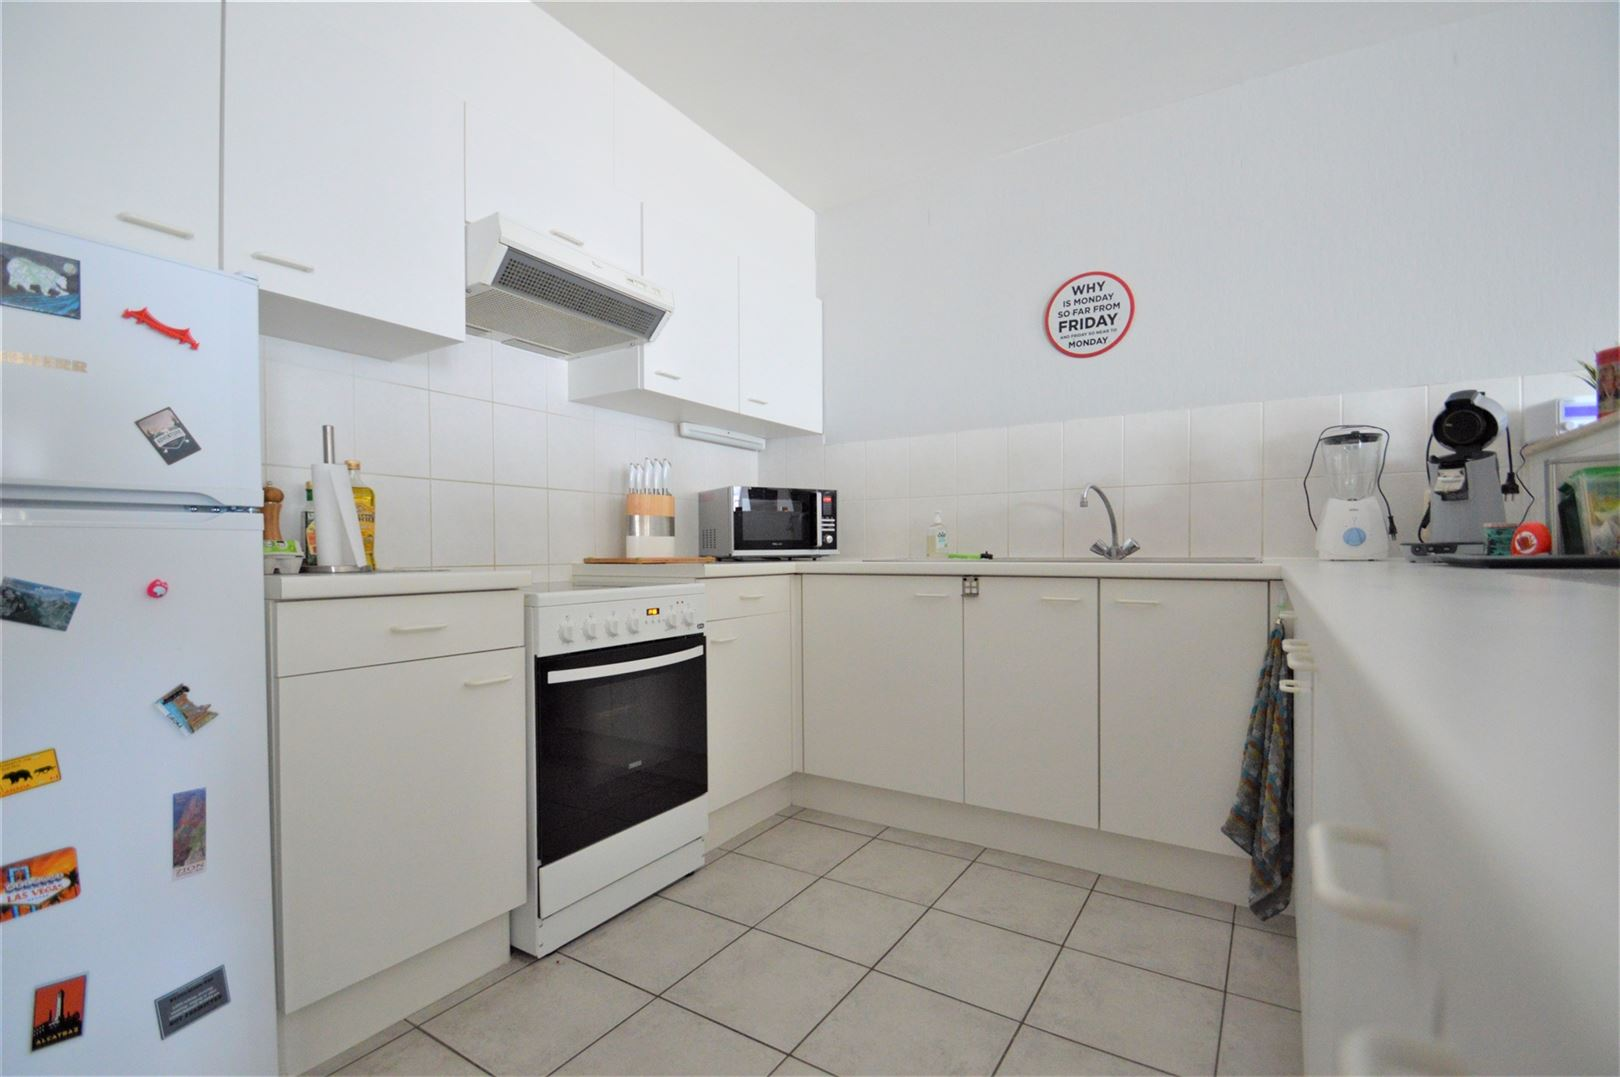 Foto 5 : Appartement te 9200 Baasrode (België) - Prijs € 630